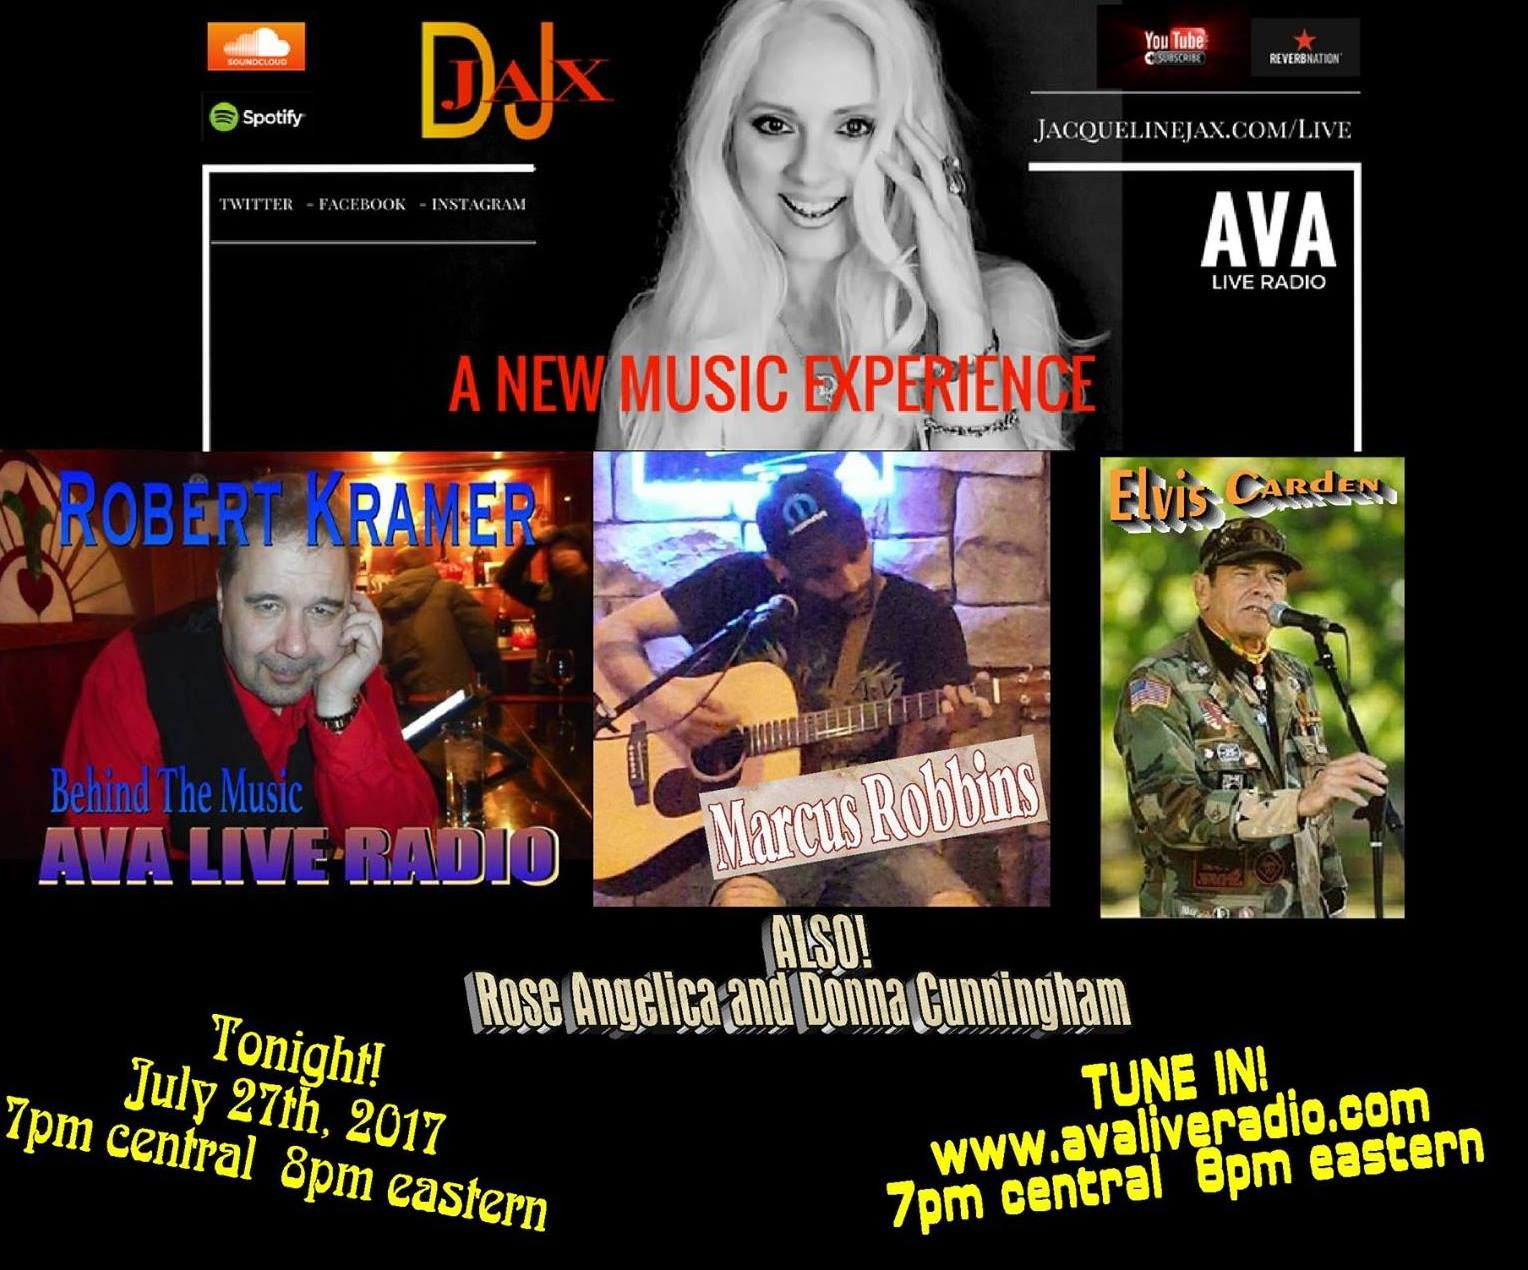 Robert Kramer On Ava Live Radio With Jacqueline Jax Kramer New Music Robert